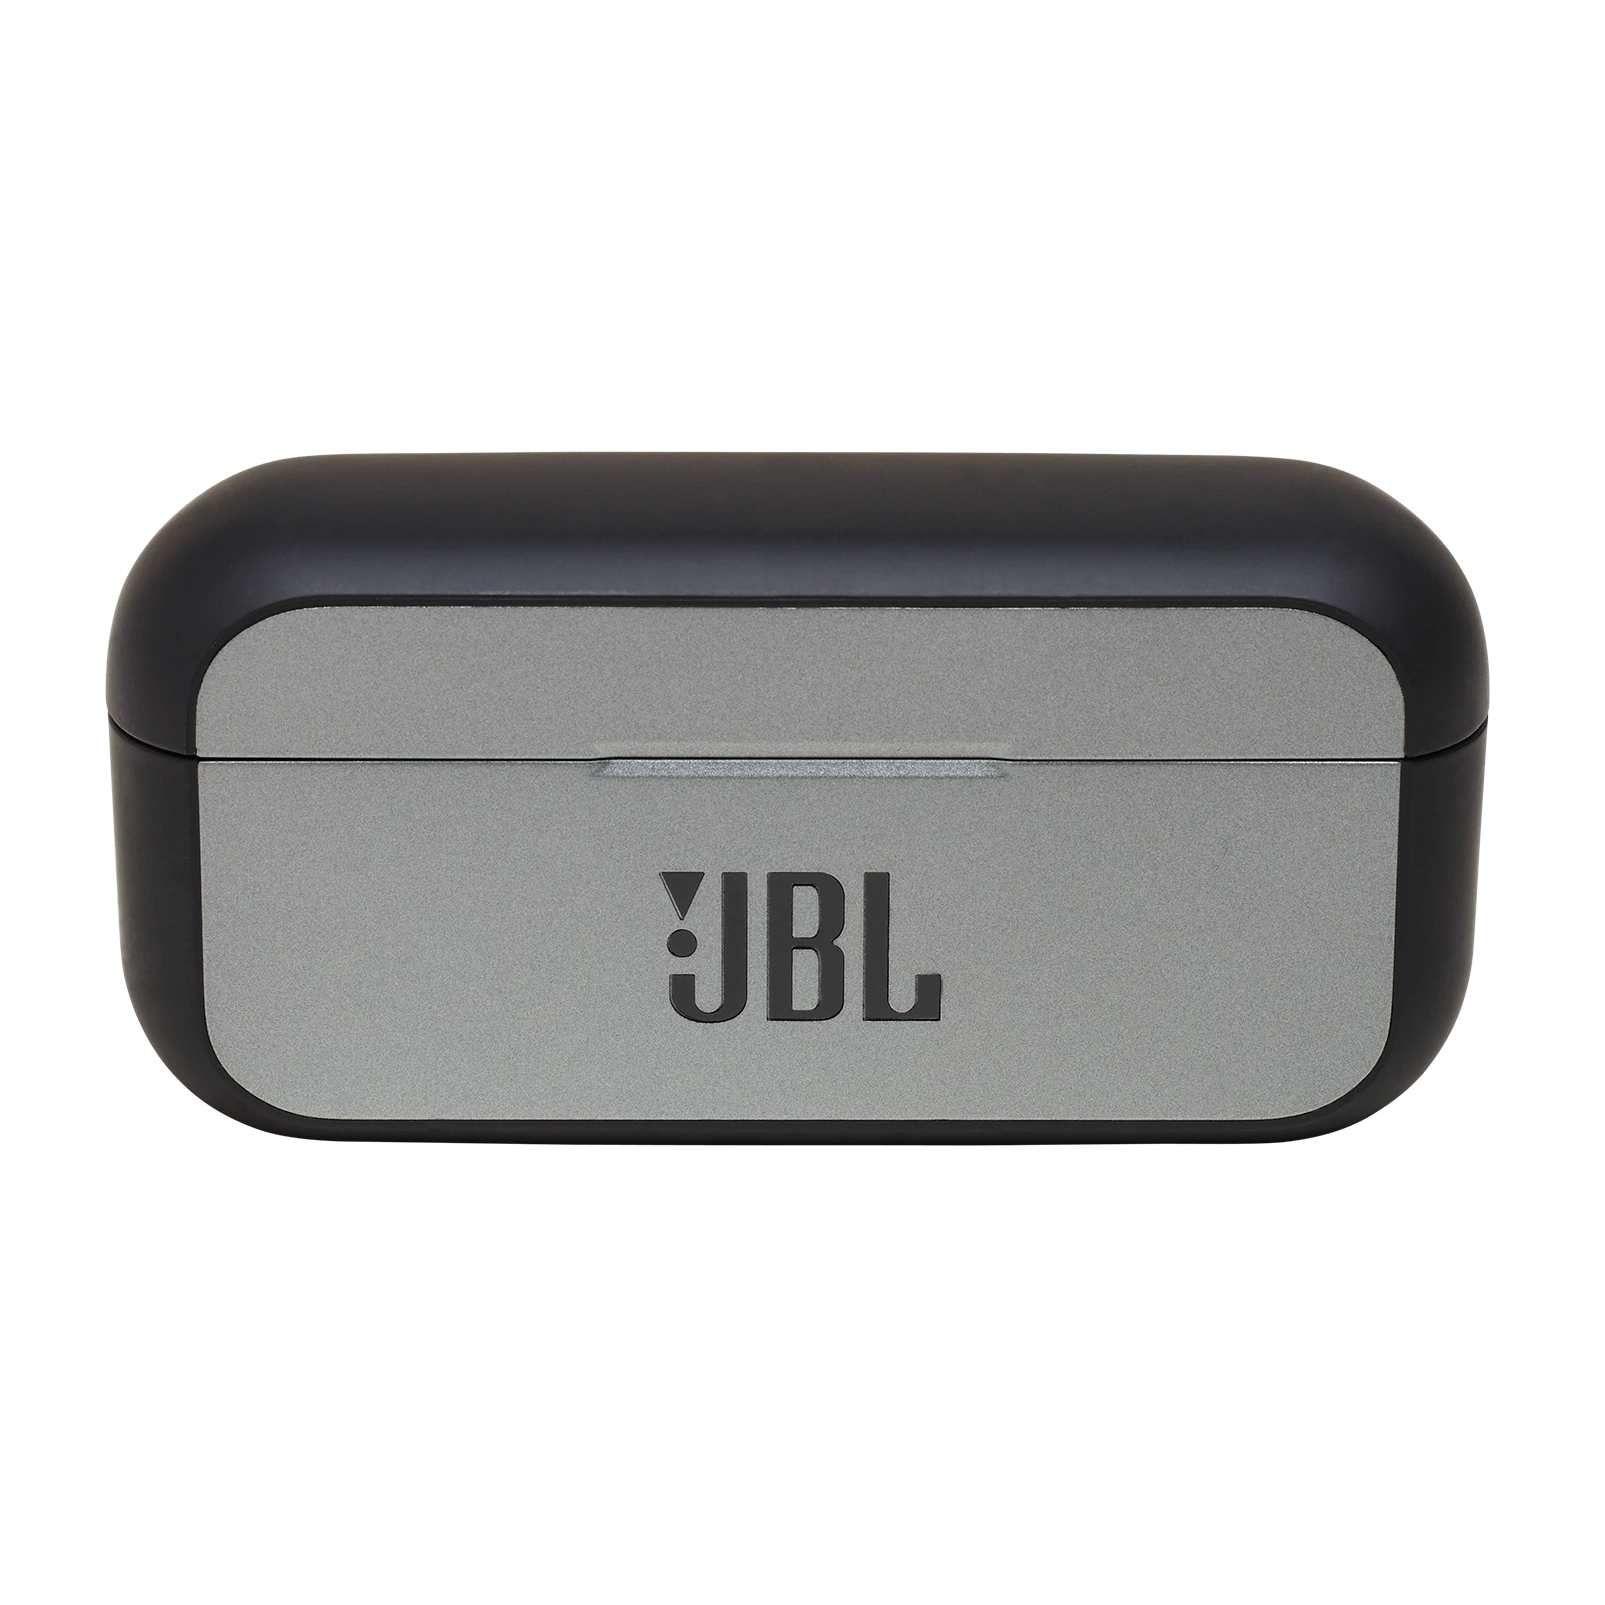 Fone de Ouvido Bluetooth JBL Reflect Flow - Preto JBLREFFLOWBLK